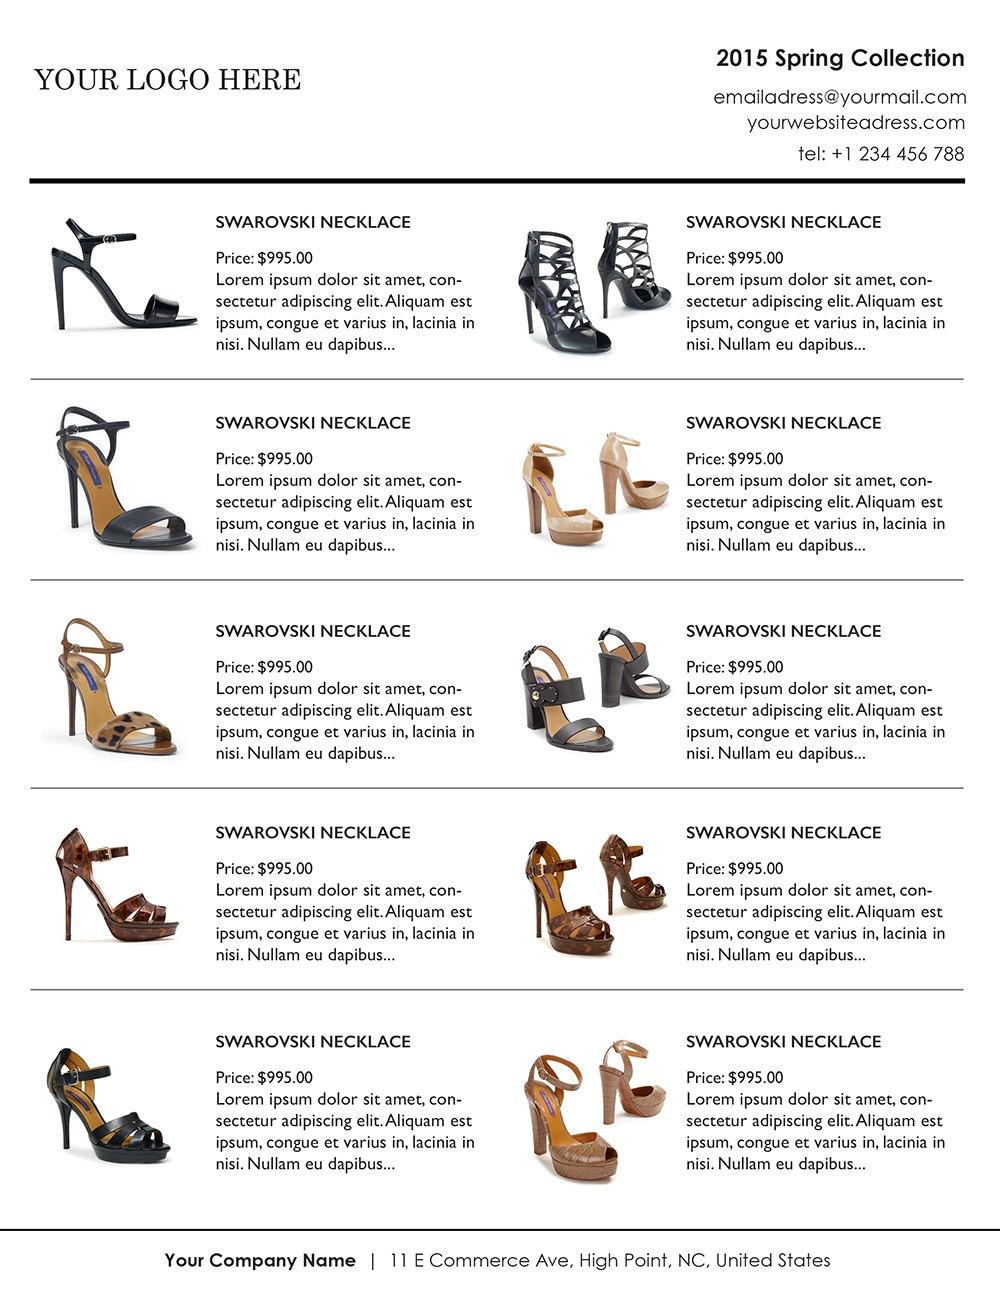 Vertical Line Sheet Wholesale Catalog template mini product